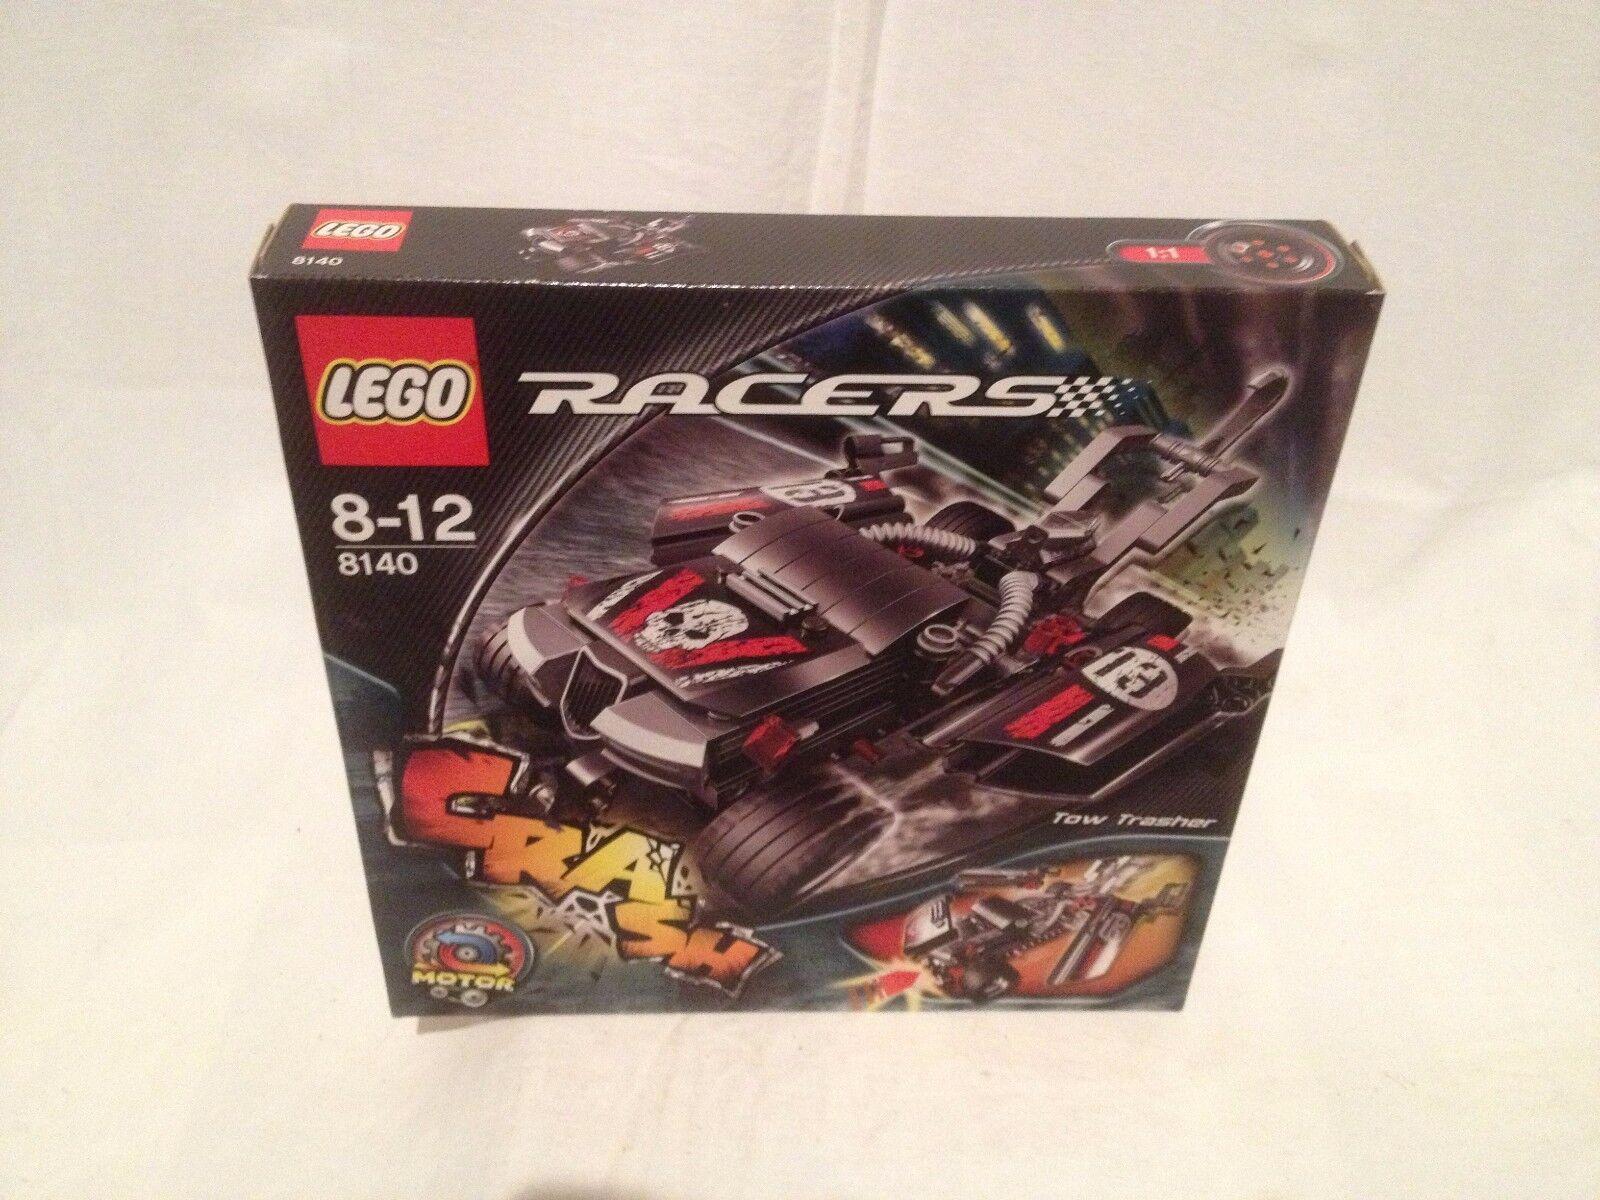 Lego Racer 8140 Tow Trasher NEUF 1 édition